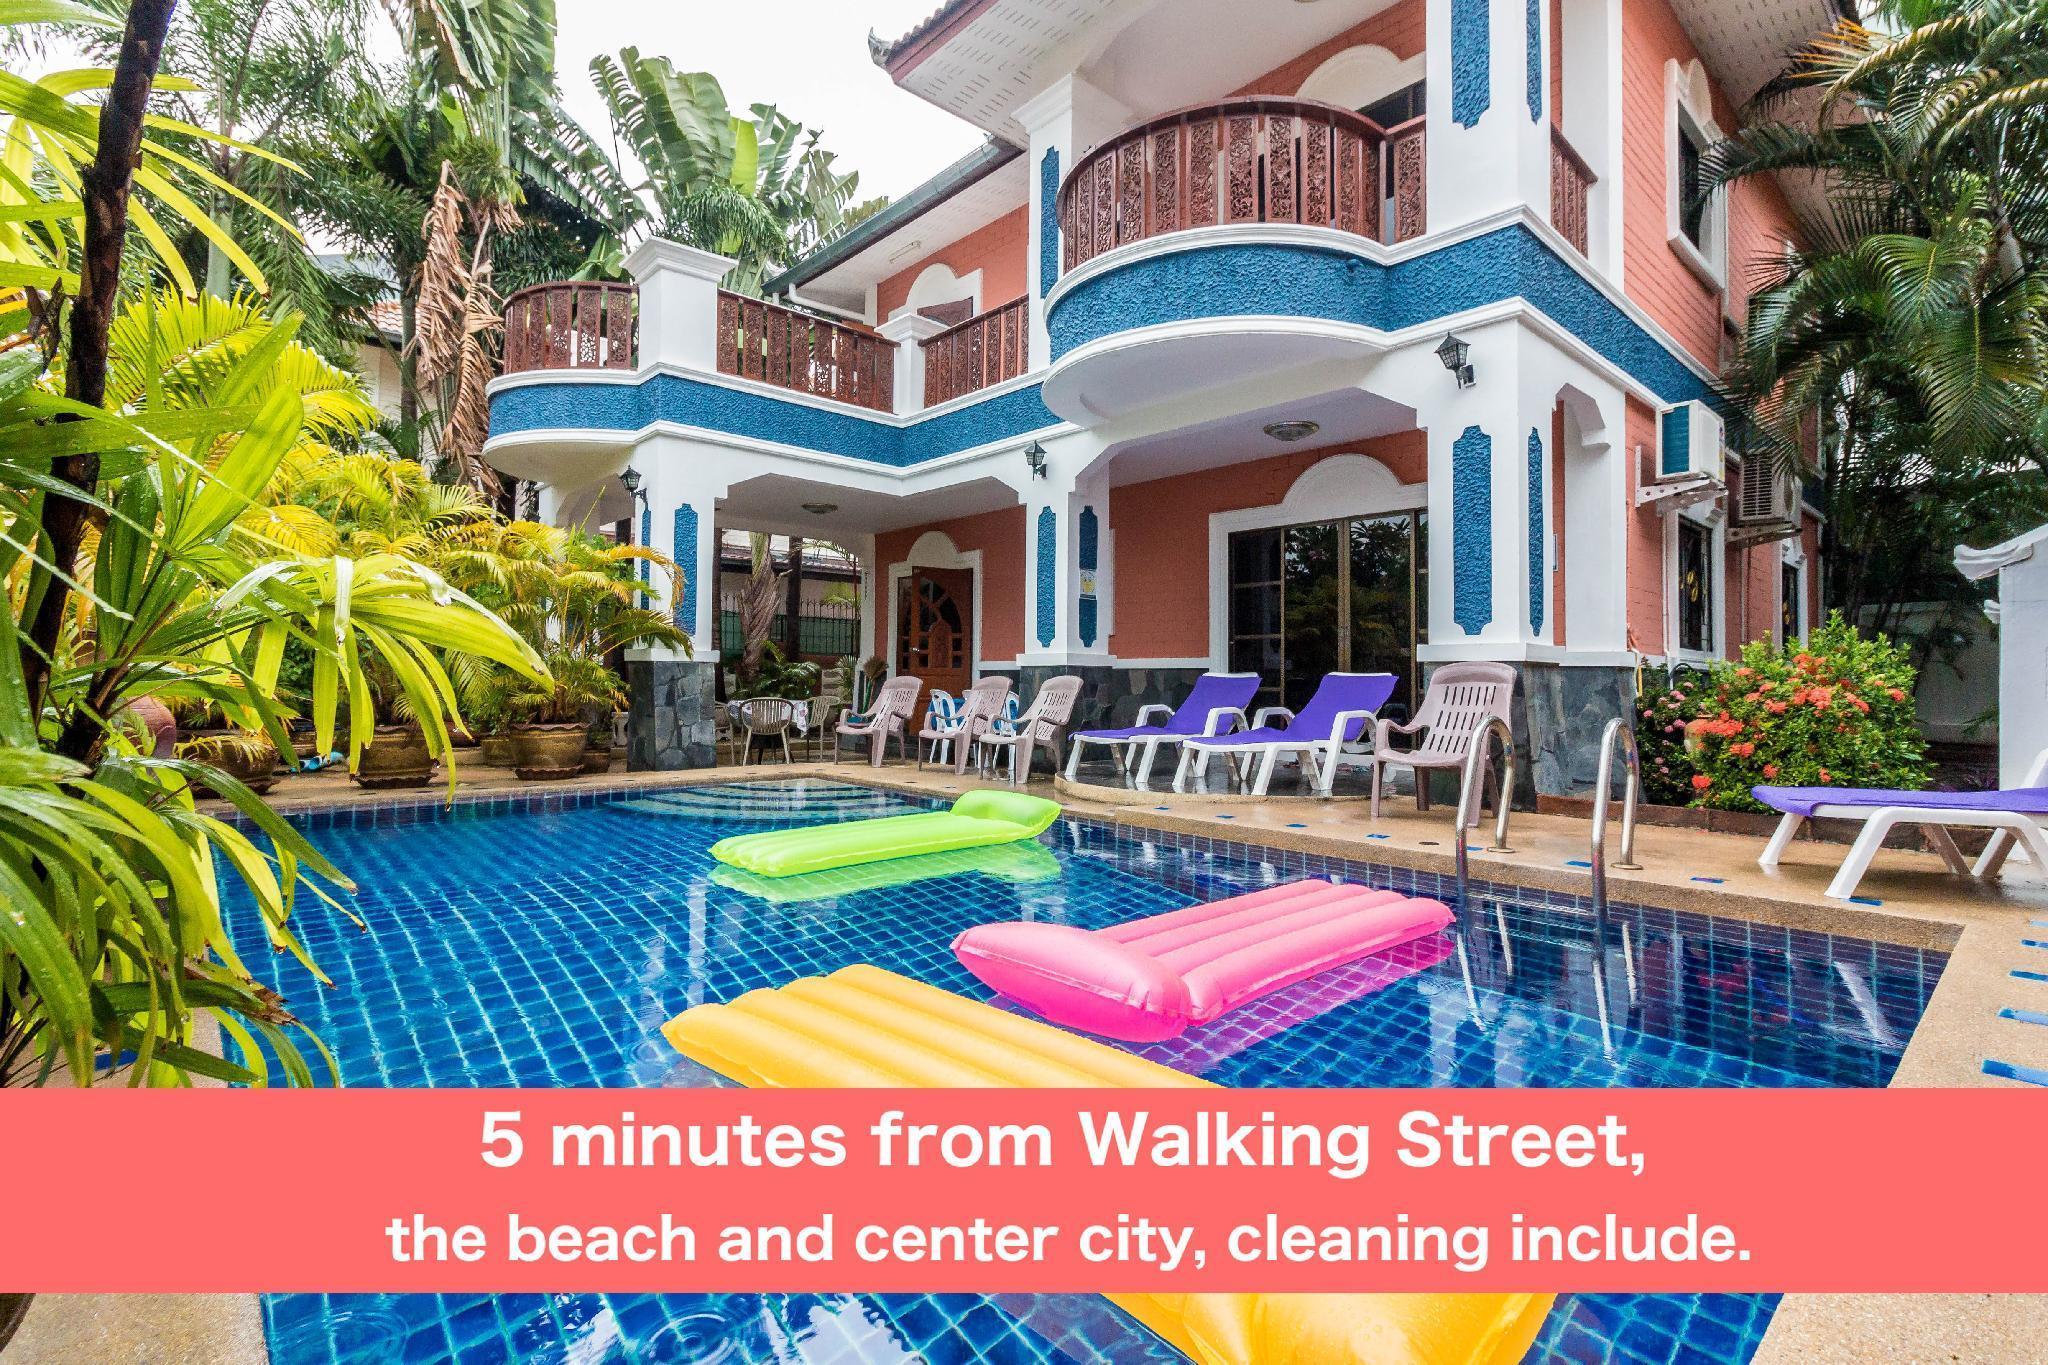 Pool villa 6 bedrooms 5 min Walking Street & beach Pool villa 6 bedrooms 5 min Walking Street & beach